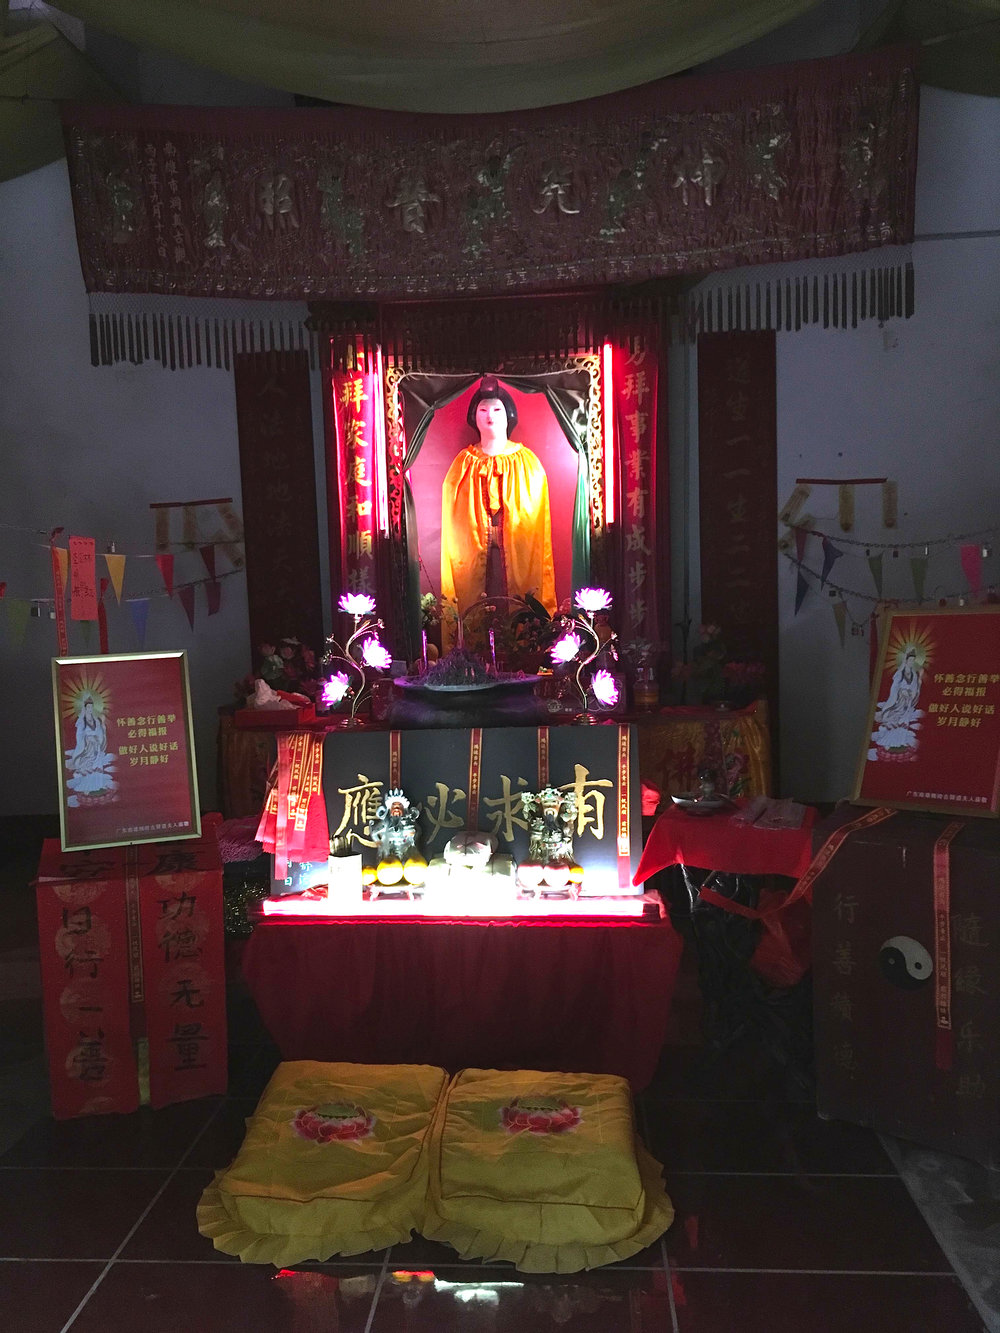 The shrines glow beautifully at night